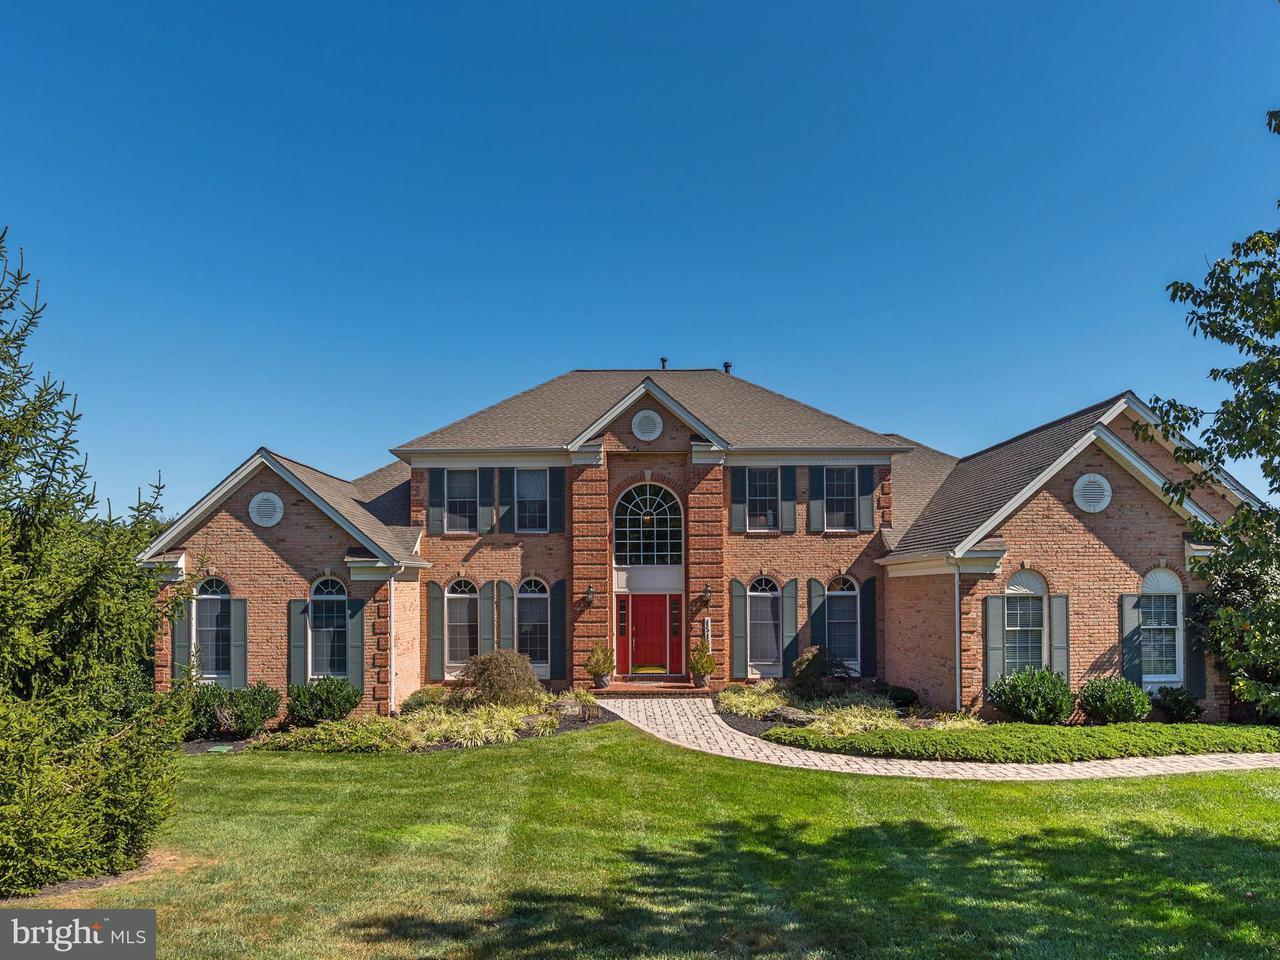 Single Family Home for Sale at 15178 Sapling Ridge Drive 15178 Sapling Ridge Drive Dayton, Maryland 21036 United States